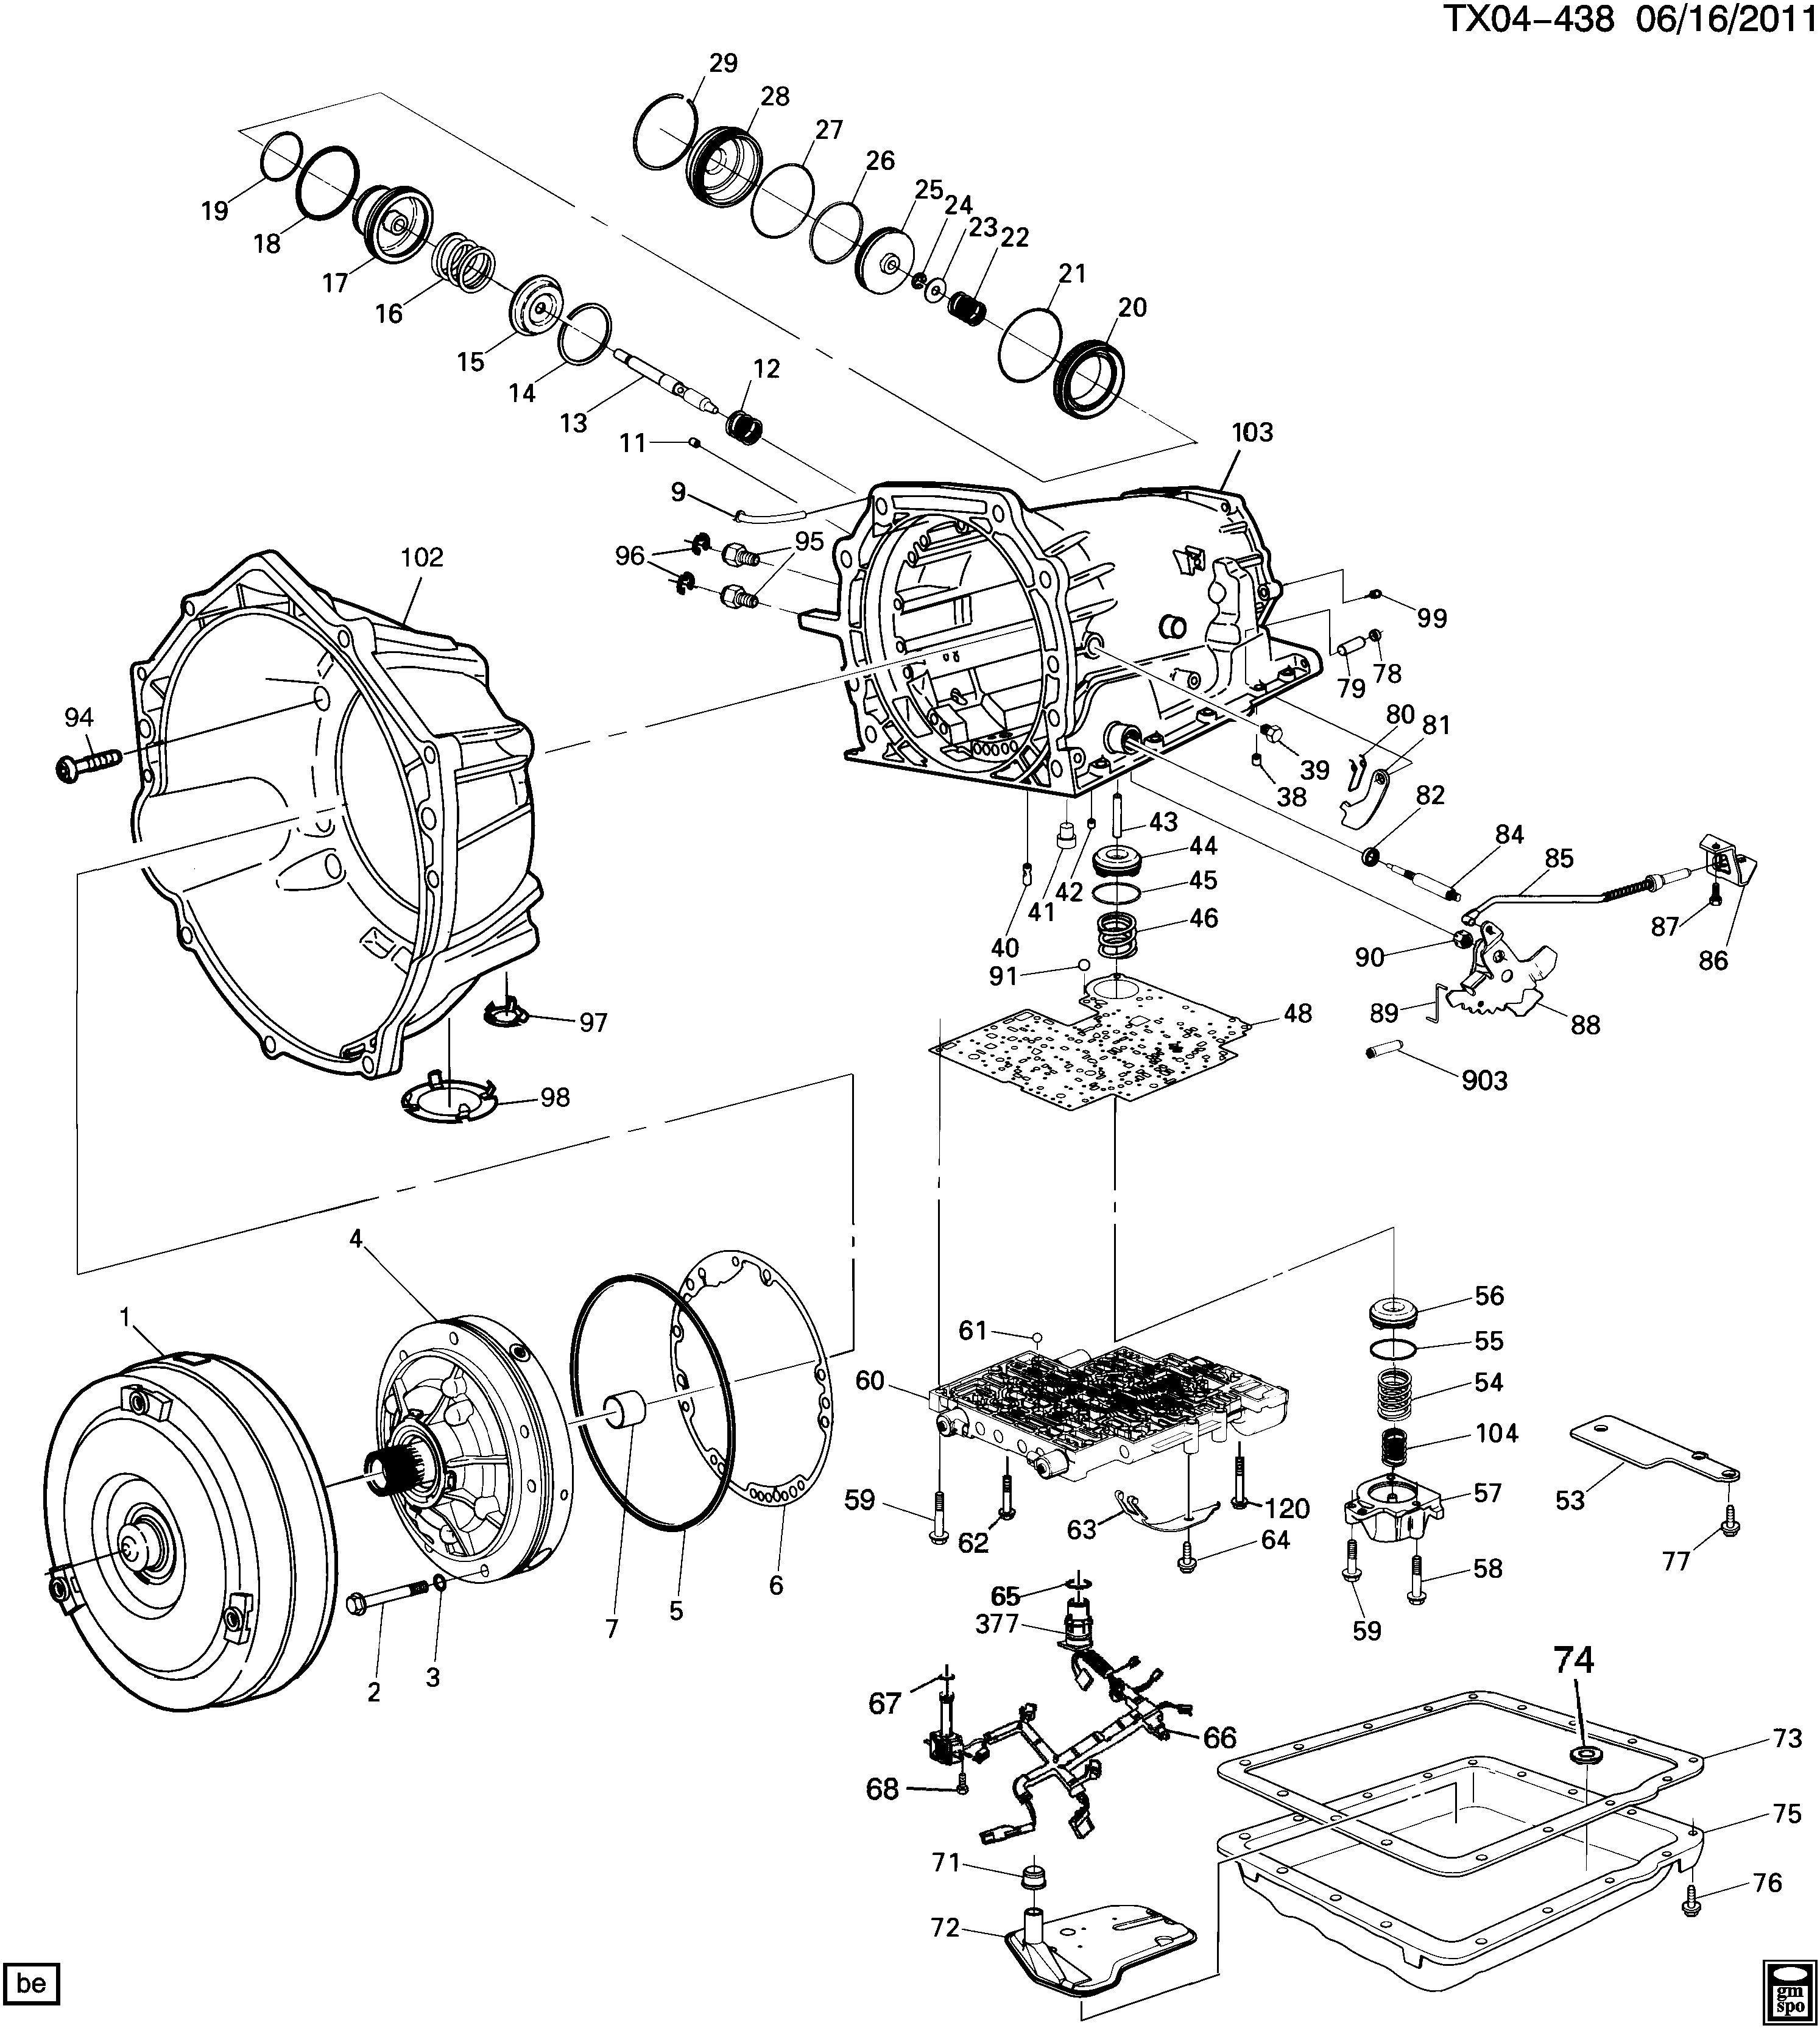 Chevrolet Silverado Magnet Transmission Case